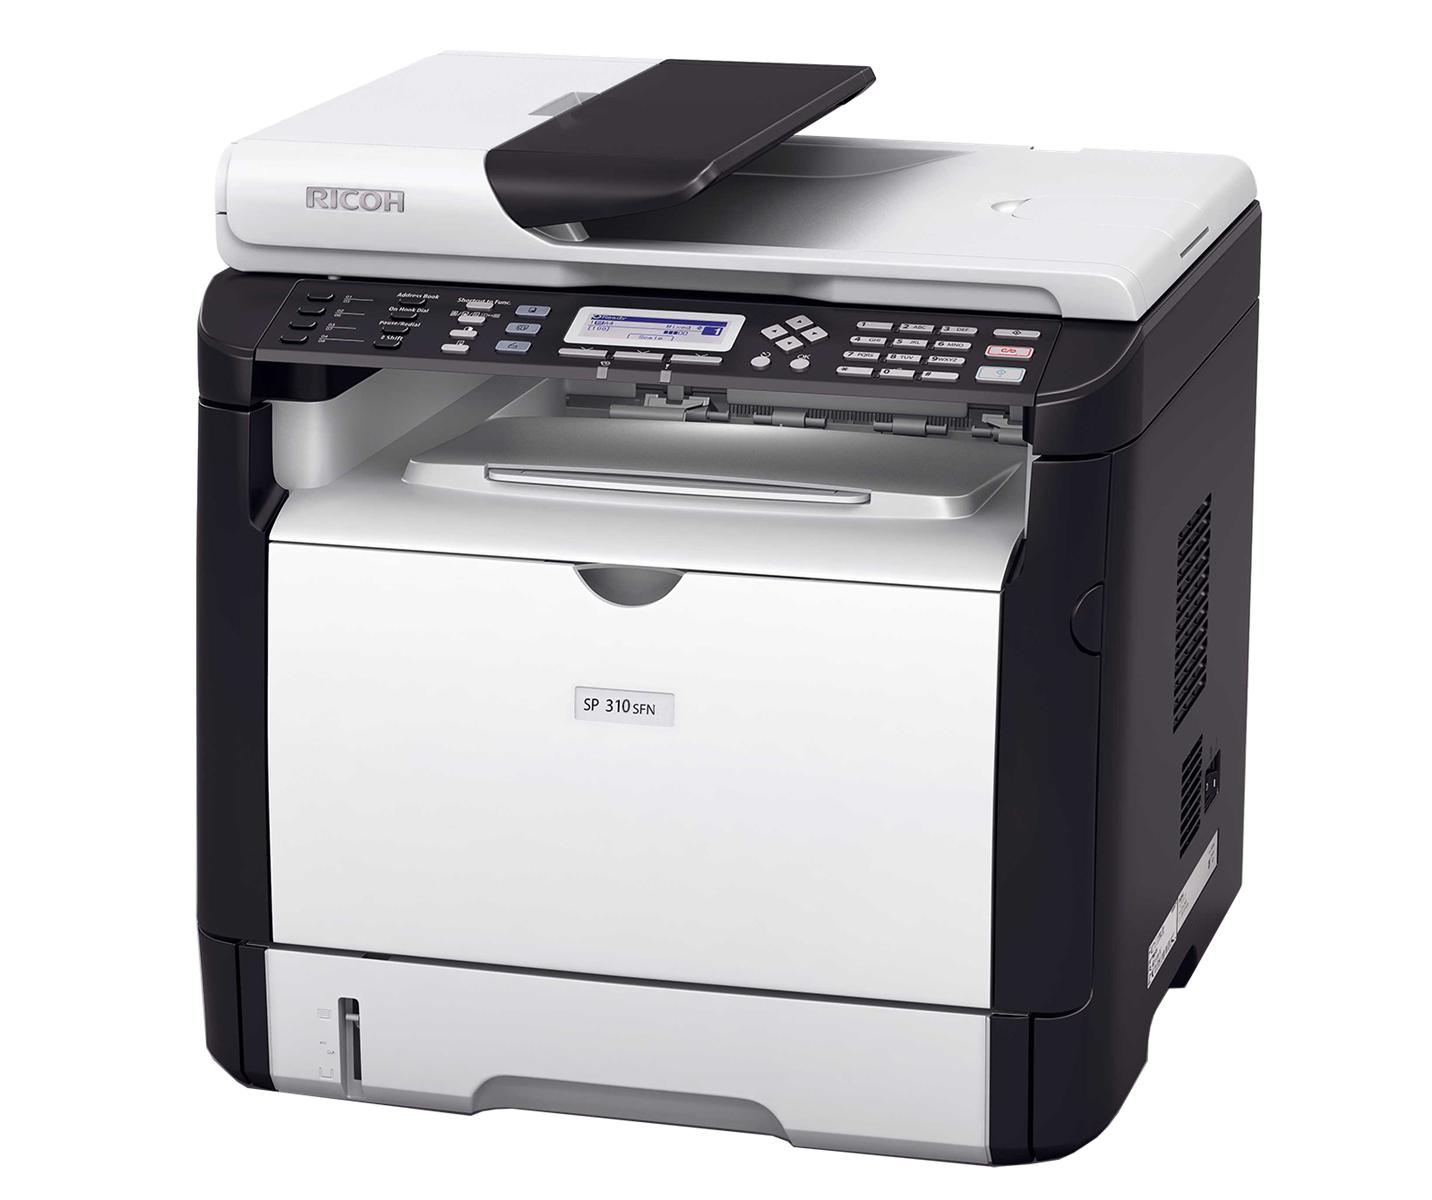 Máy in Ricoh SP-310SFN, In, Scan, Copy, Fax, Network, Laser trắng đen